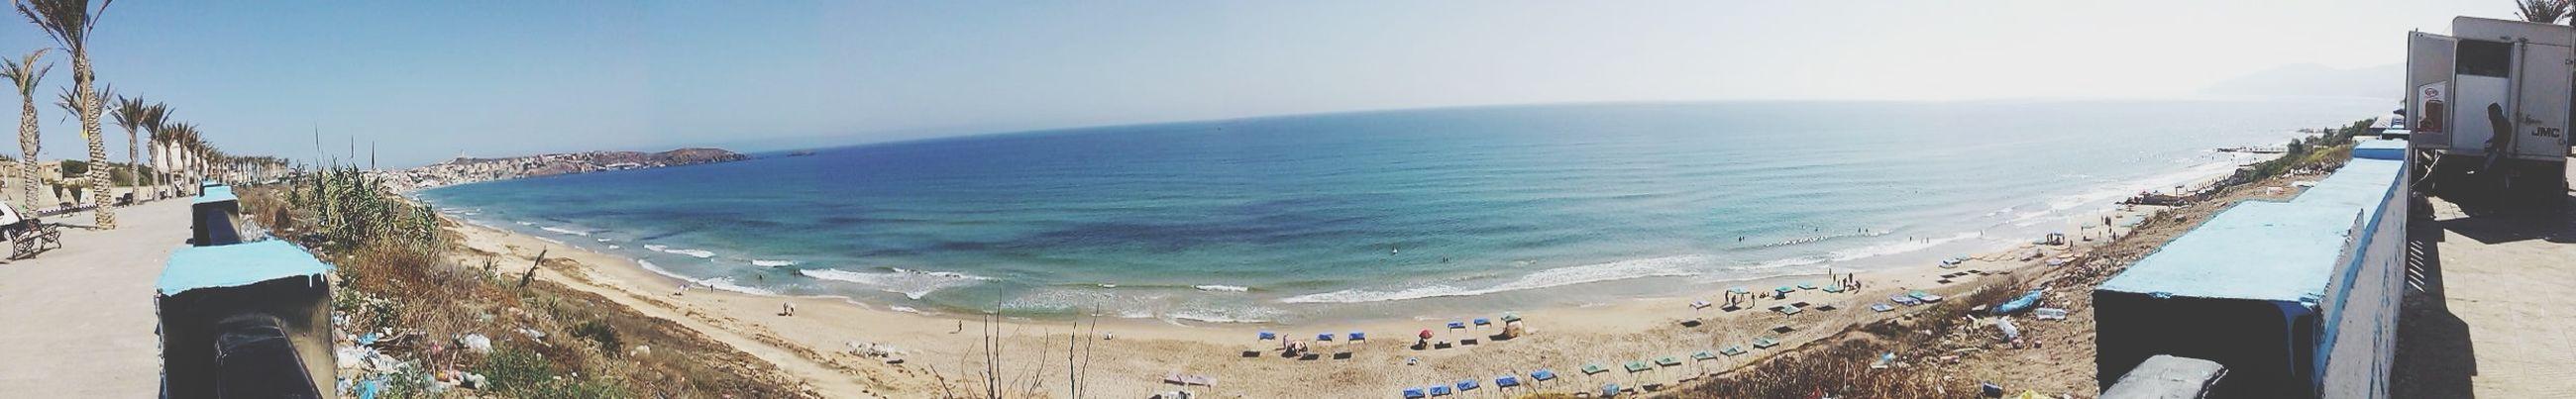 Panoramic Photography Panoramic Panoramic View Oran  Algeria Oran Algeria Sea_collection Sea Sea And Sky Sea View